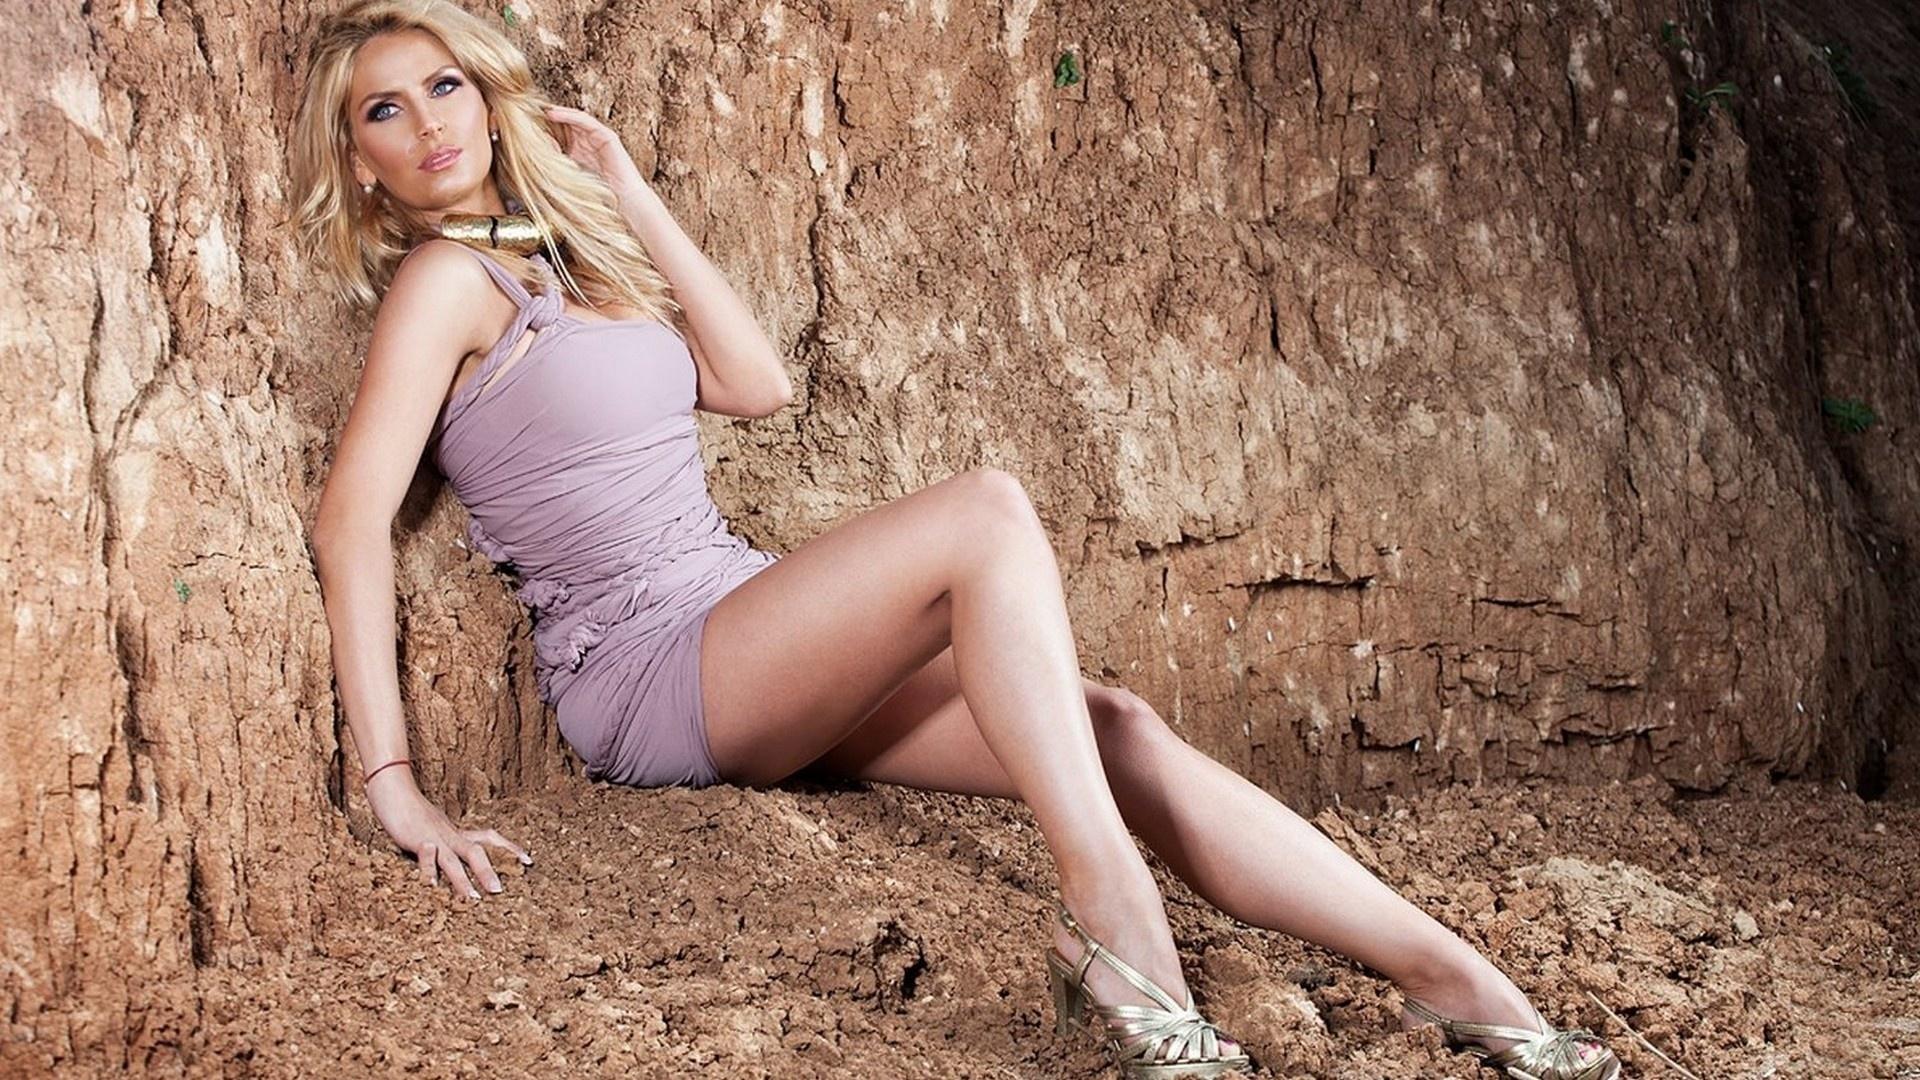 блондинка, взгляд, грудь, ножки